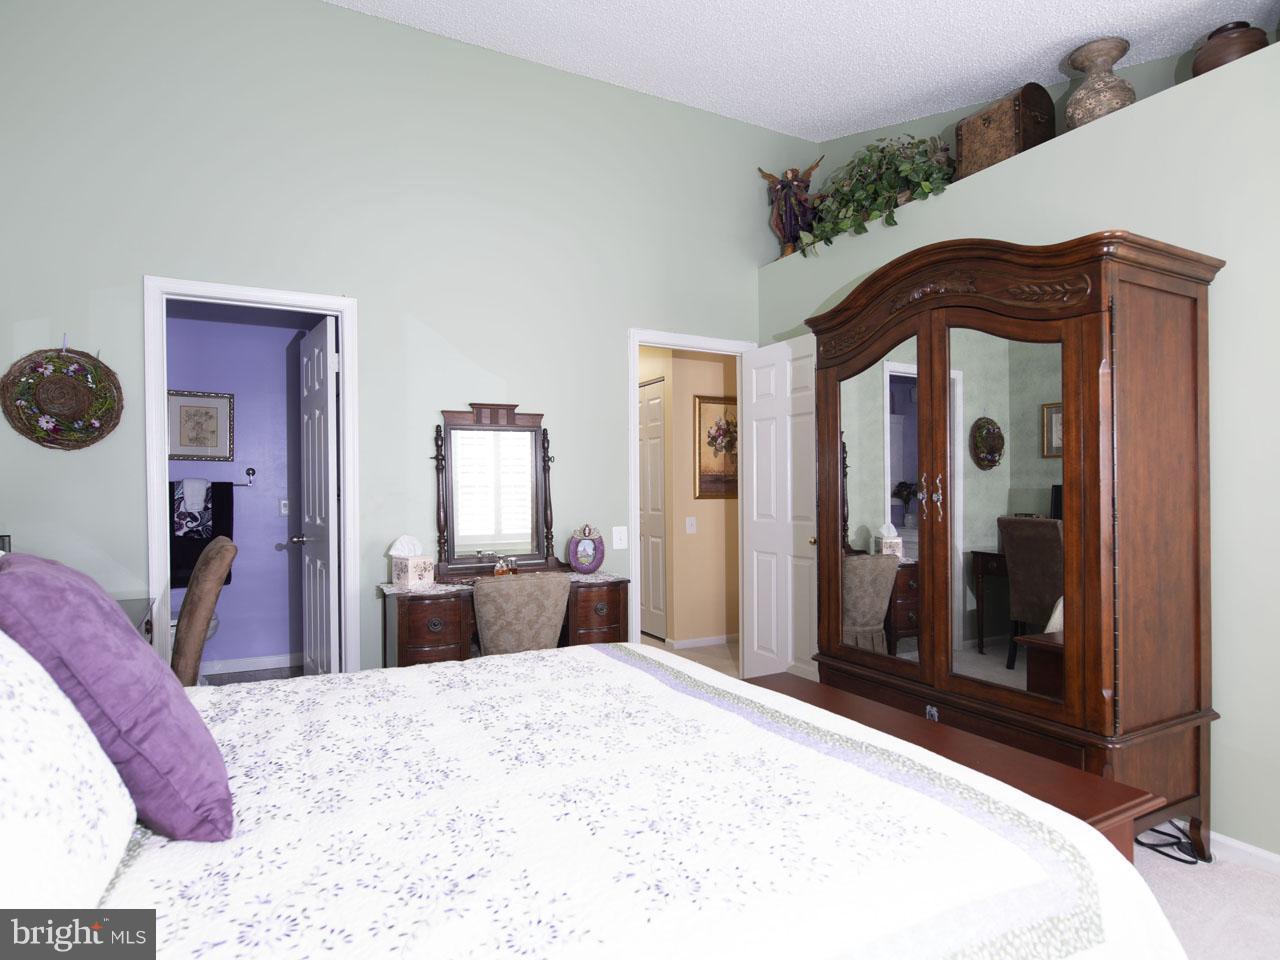 1002640508-300537944011-2021-07-22-05-00-38     Pinecrest   Alexandria Delaware Real Estate For Sale   MLS# 1002640508  - Best of Northern Virginia